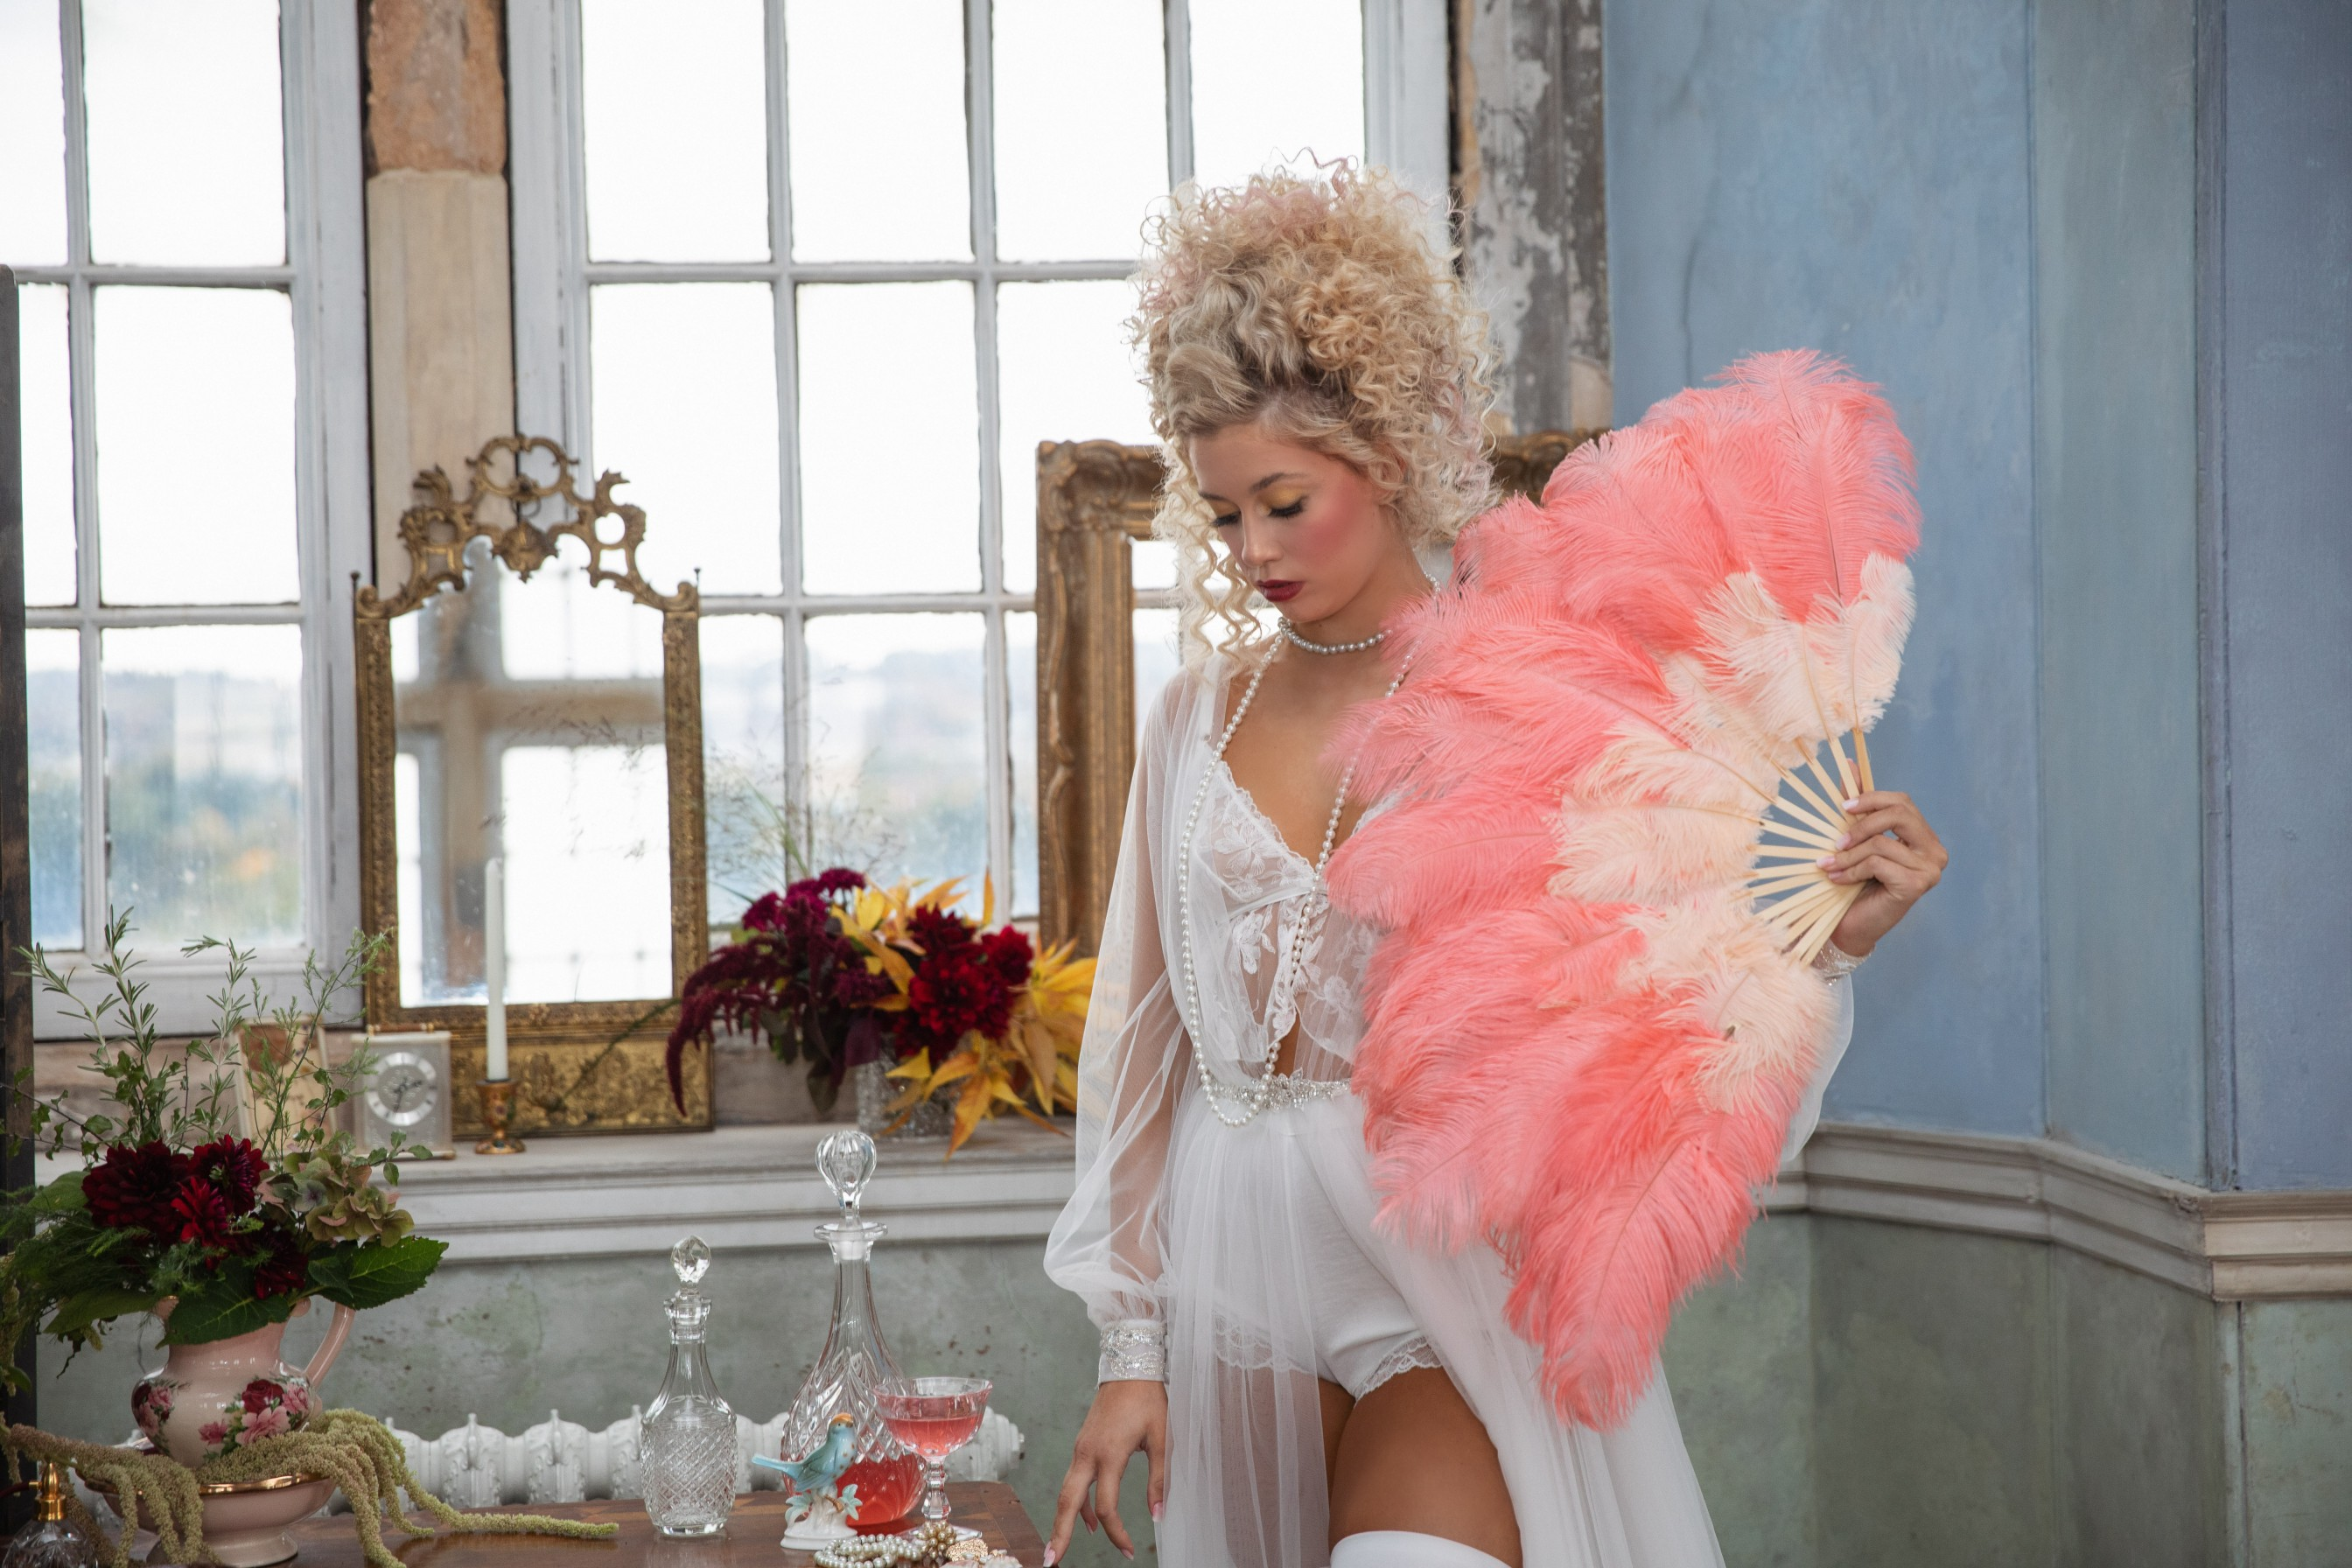 themed wedding - unique bridal hair - alternative bridal look - vintage wedding accessories - vintage bridal underwear